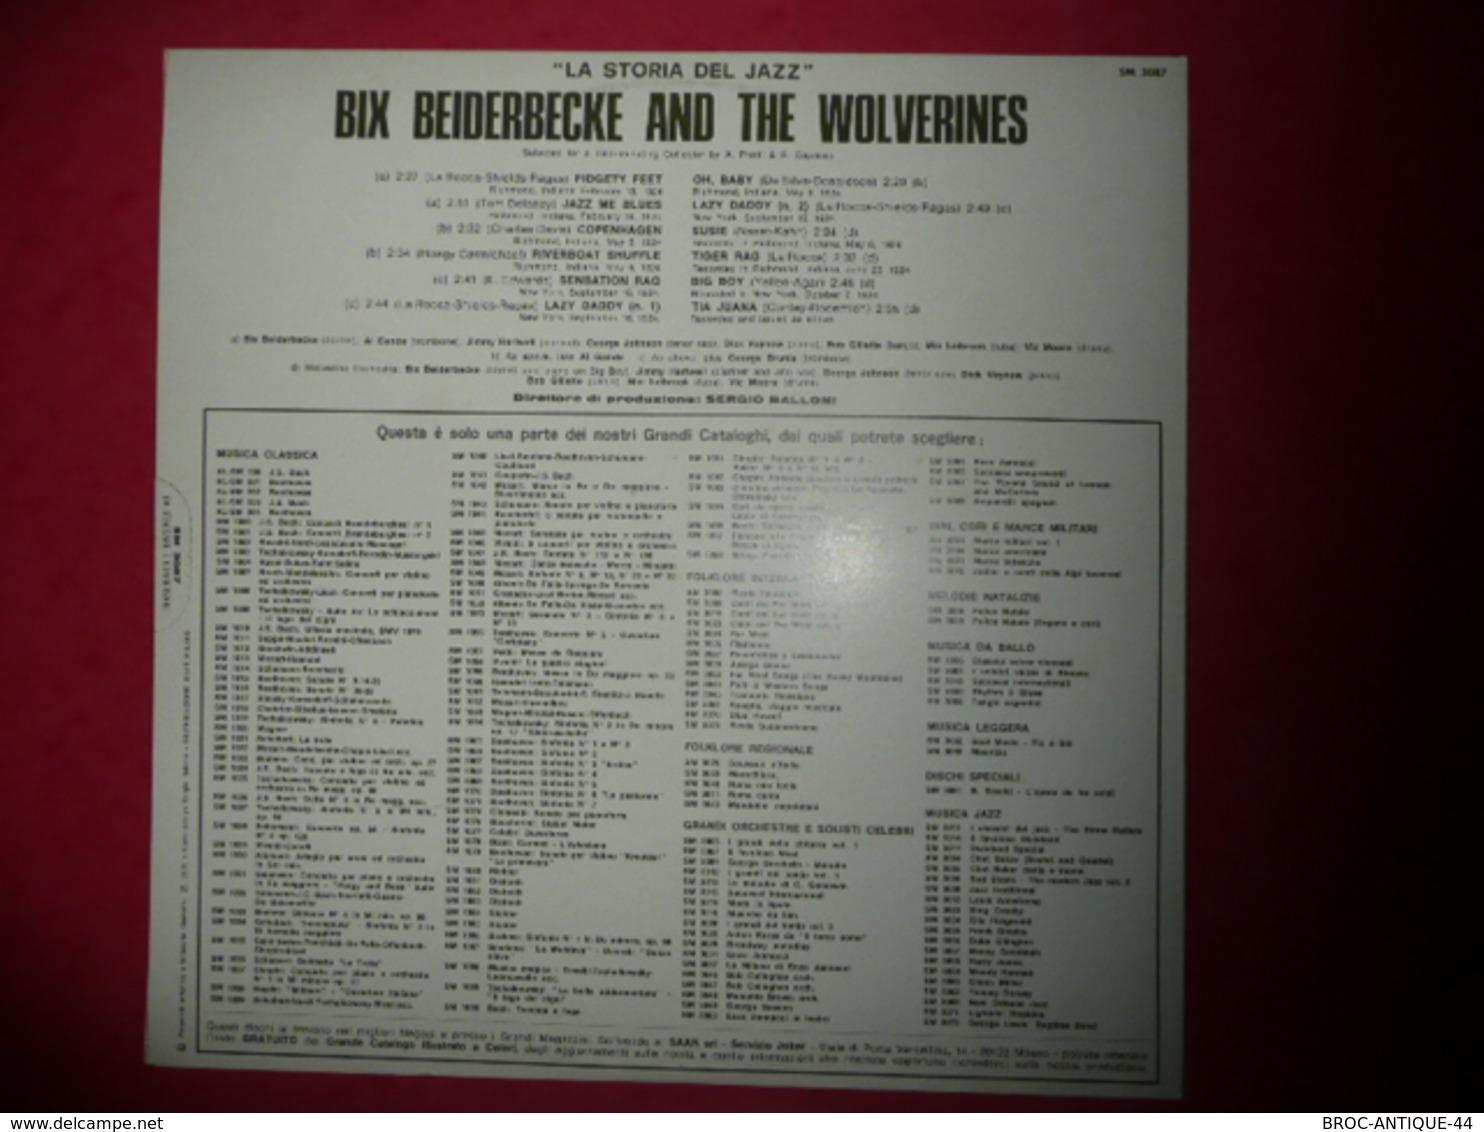 LP33 N°711 - BIX BEIDERBECKE & THE WOLVERINES - COMPILATION 12 TITRES - Jazz